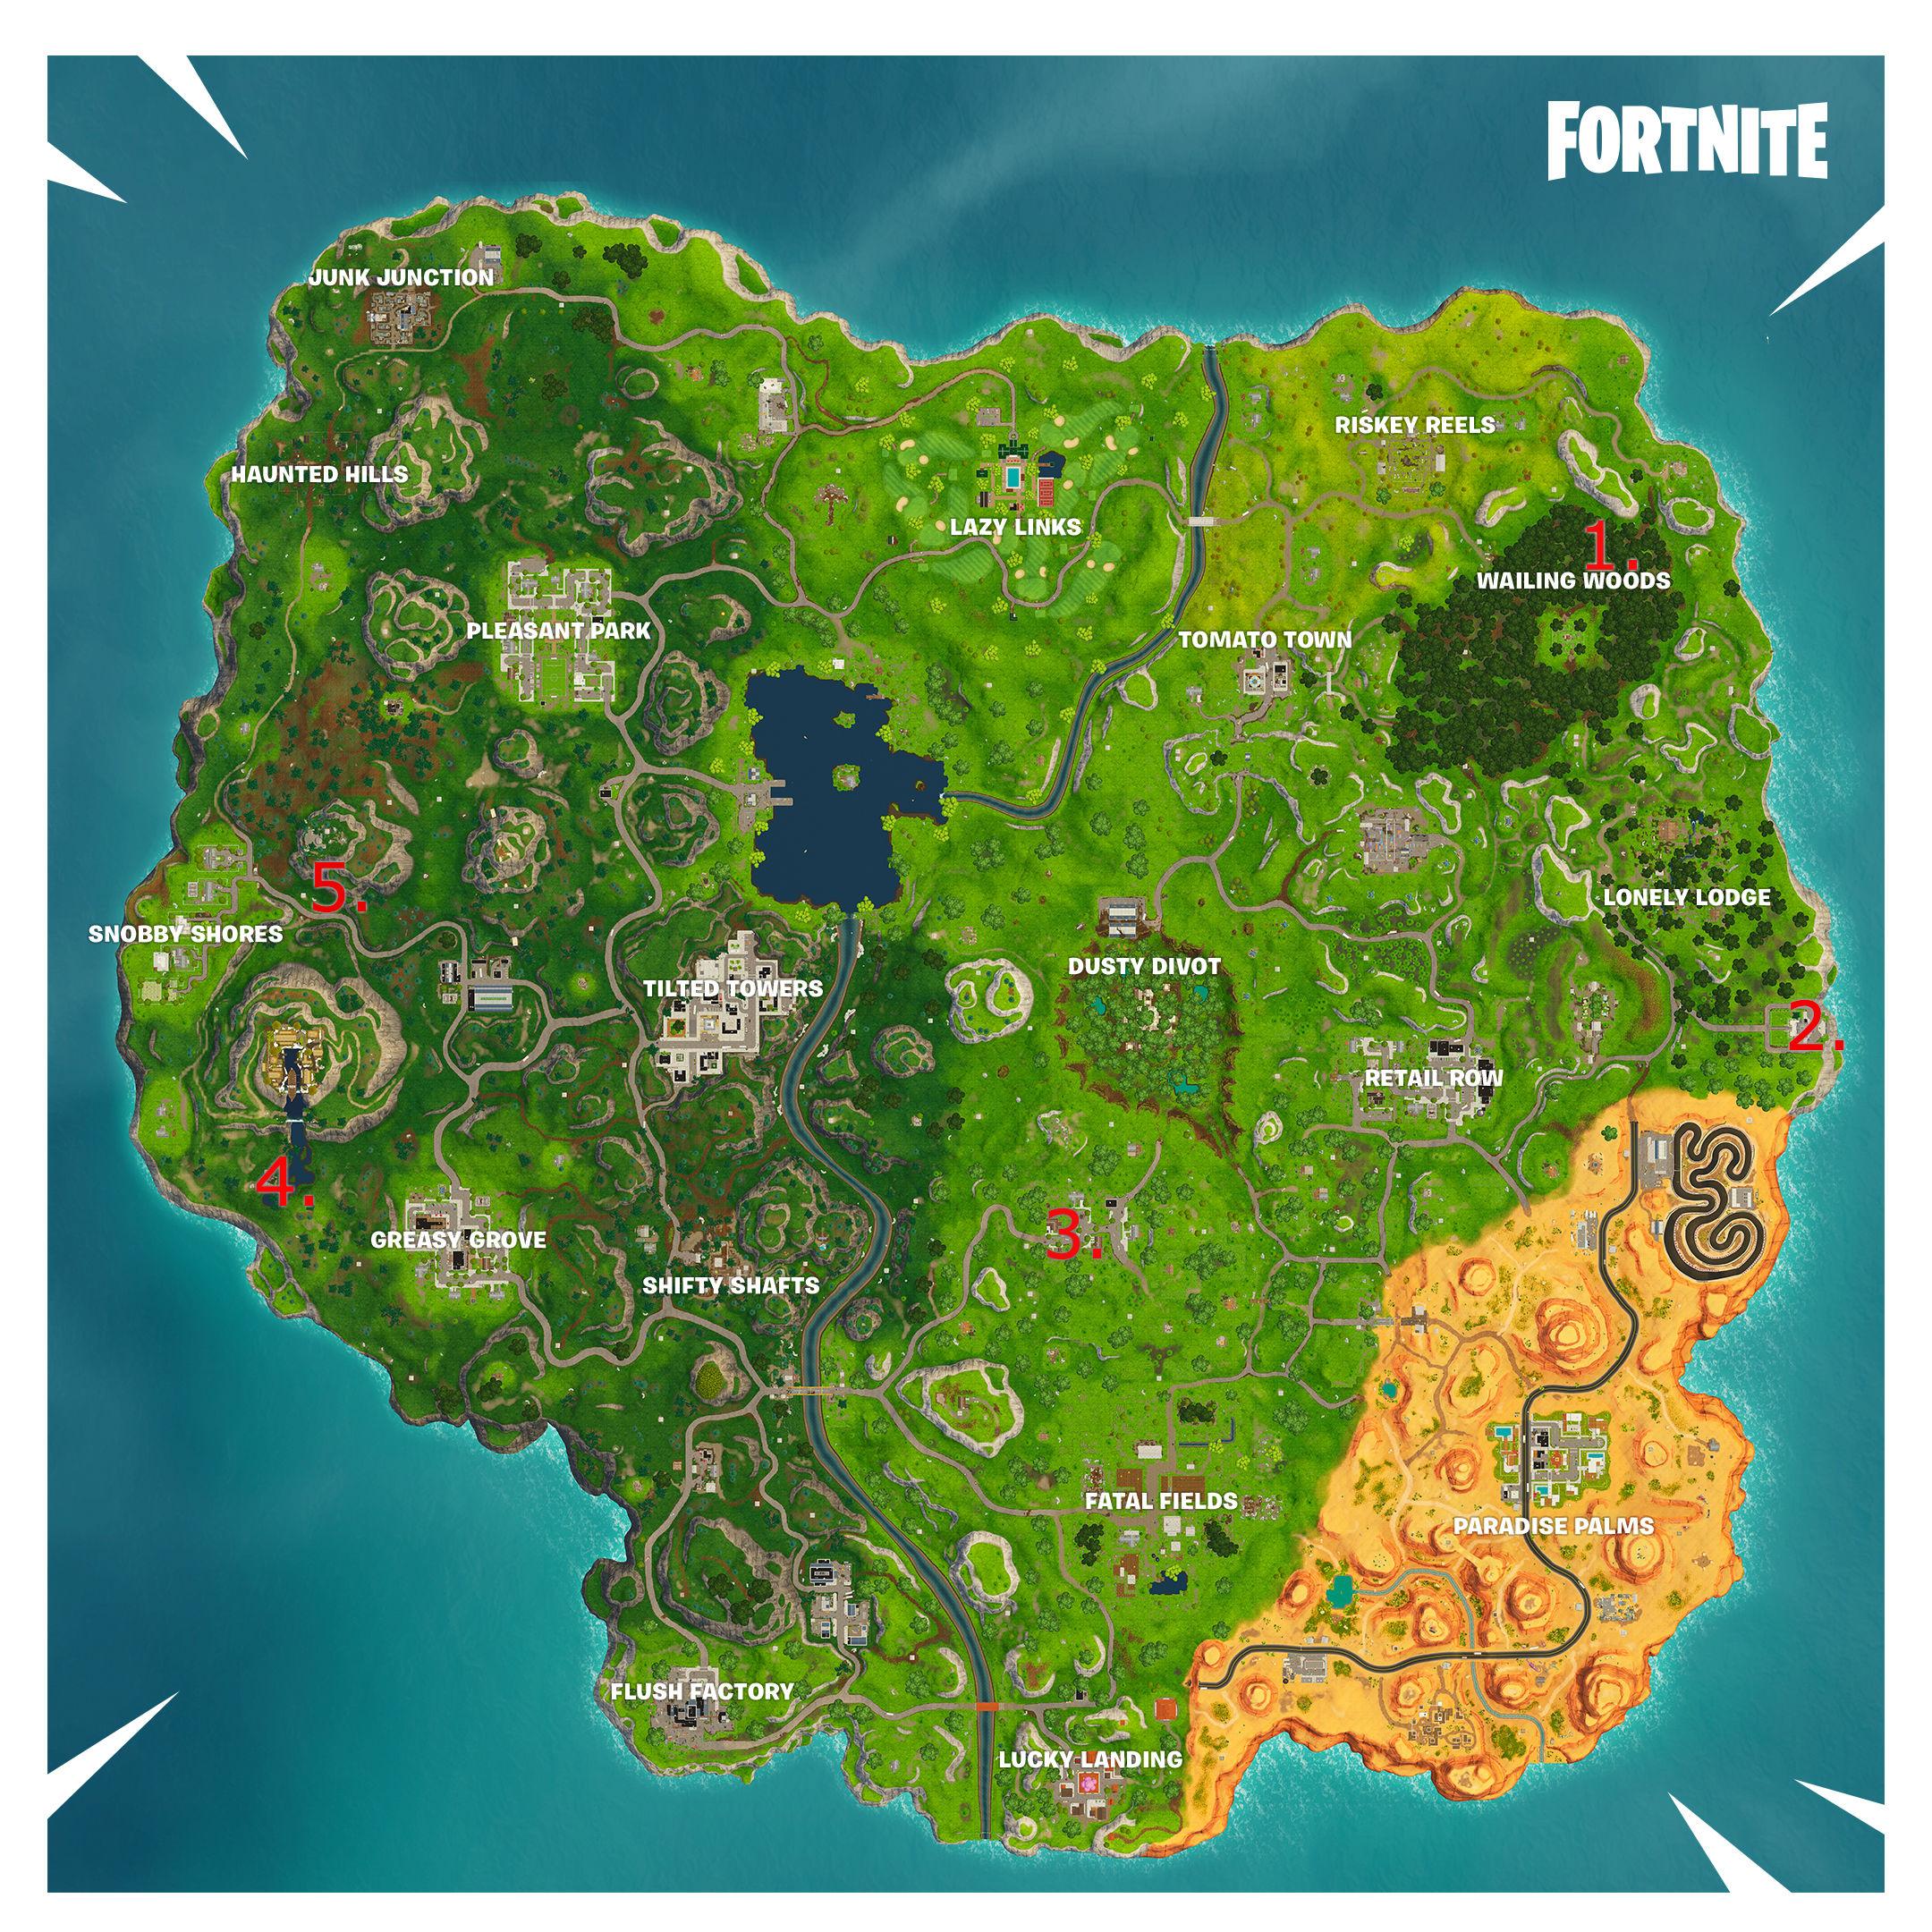 Fortnite: Top 5 hidden locations